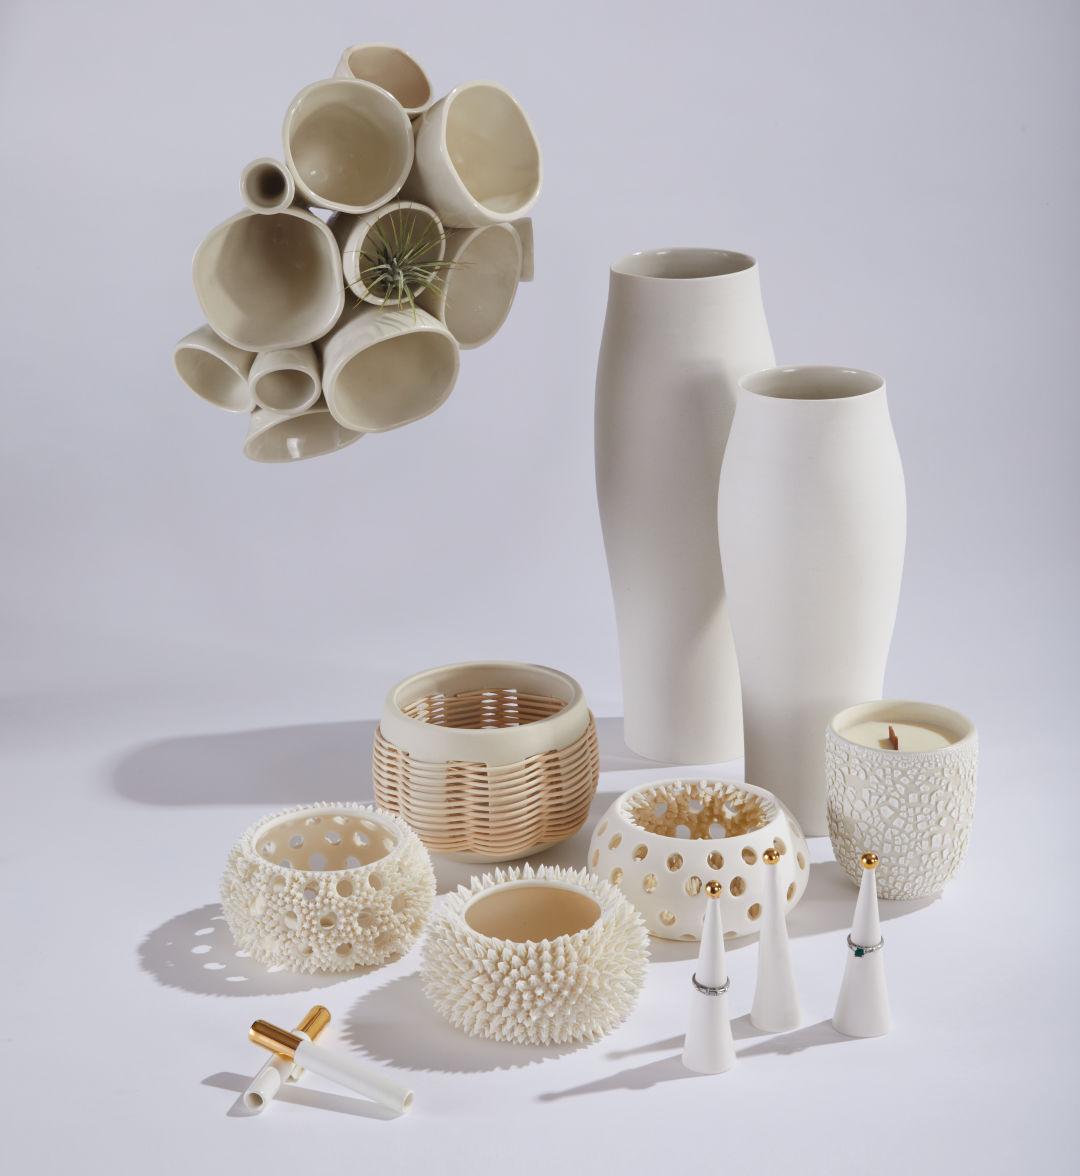 Da2017 ceramics see life u0couq